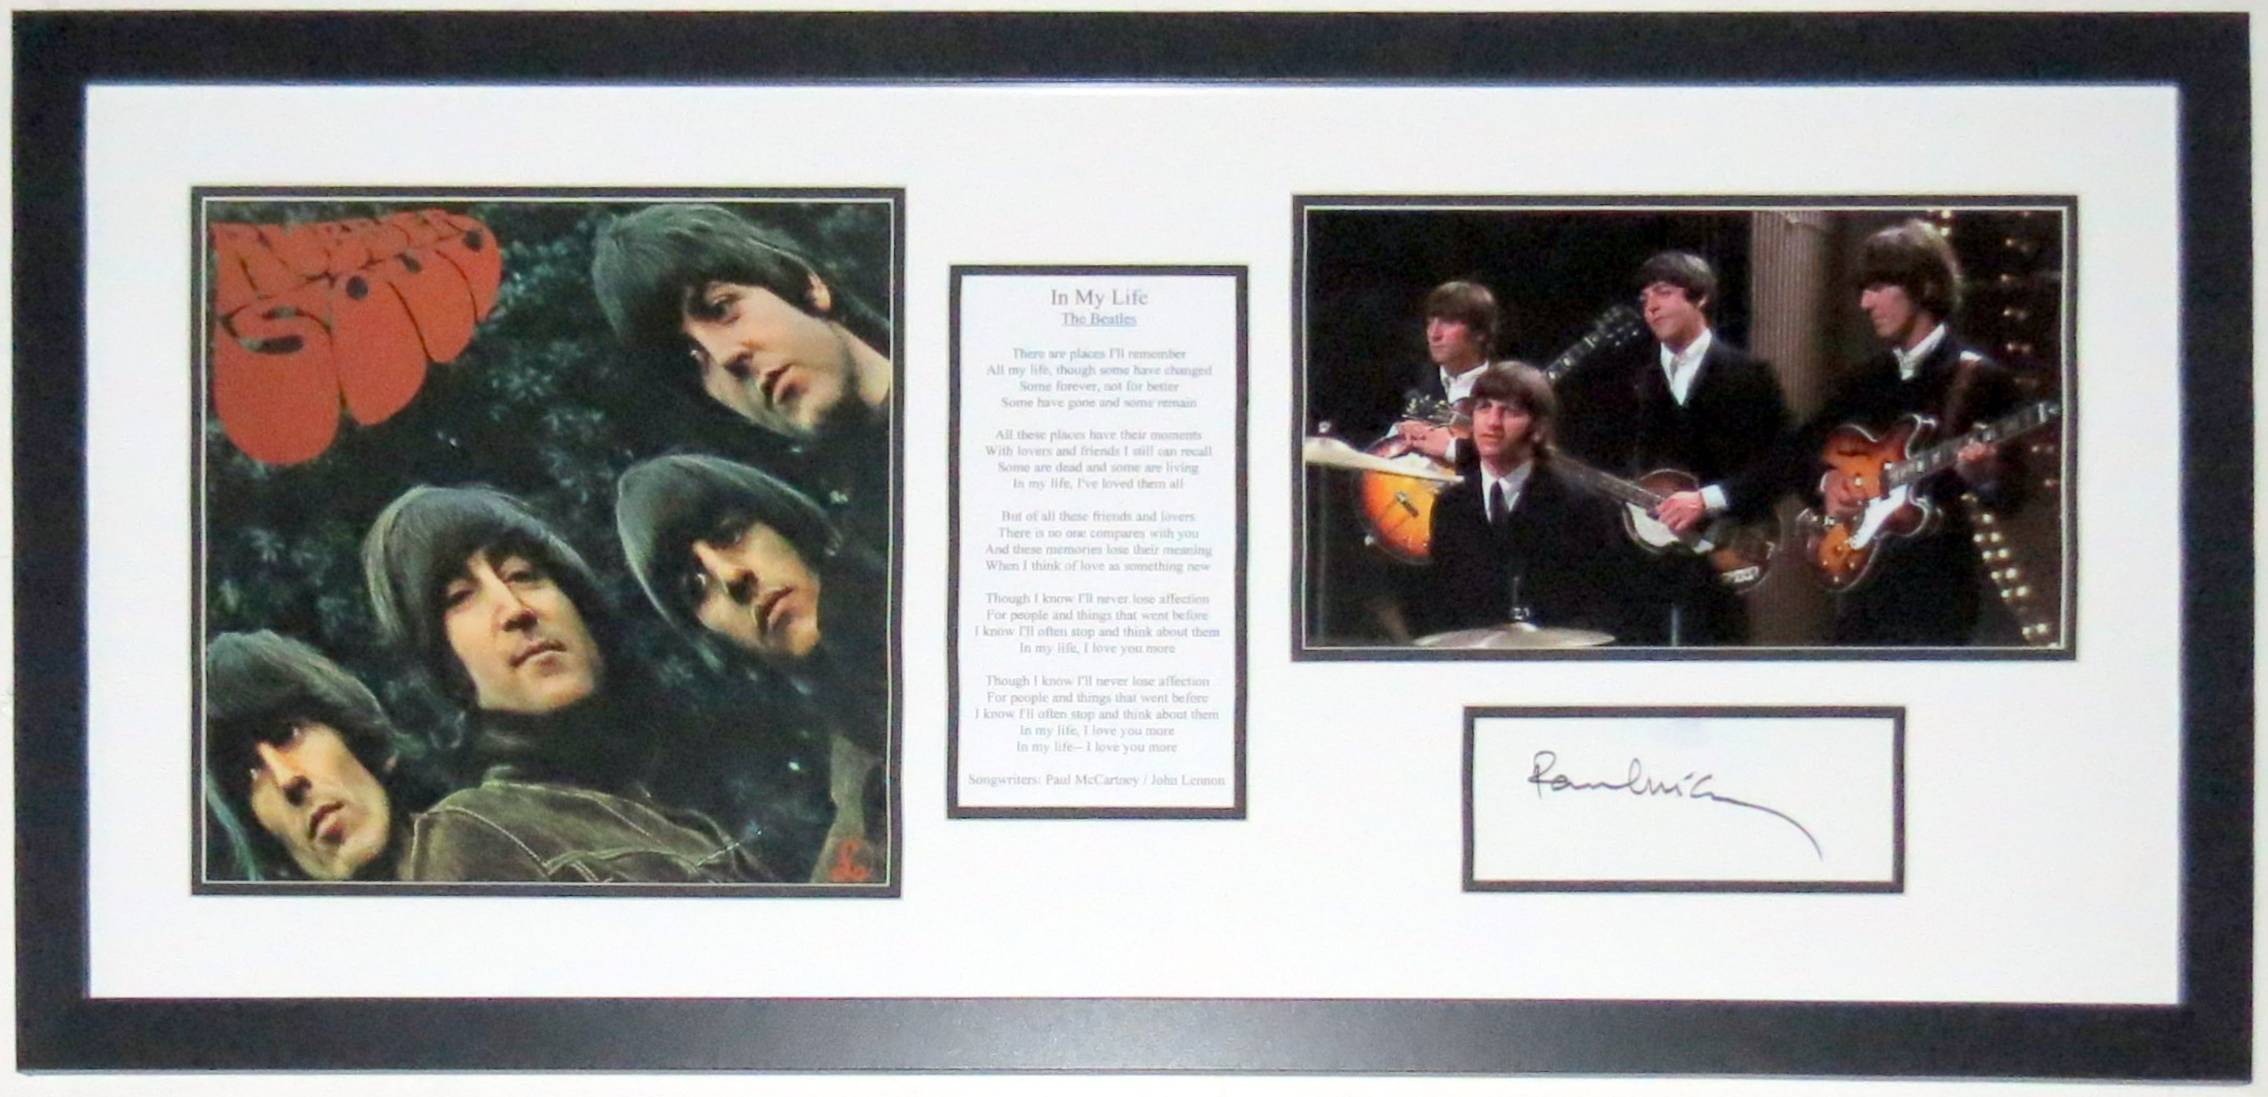 Paul McCartney Signed Beatles Rubber Soul Album Lyrics & Photo Compilation - PSA DNA COA Authenticated - Custom Framed 34x20